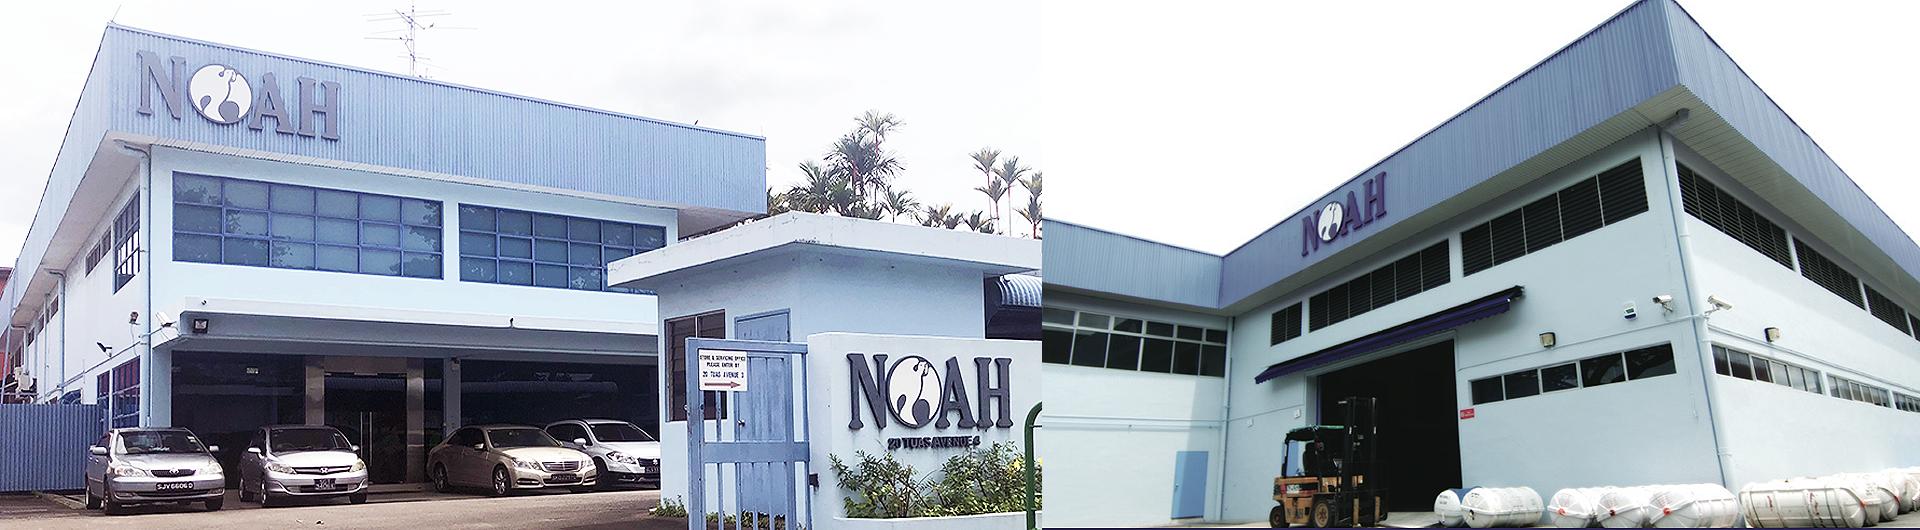 Noah Building